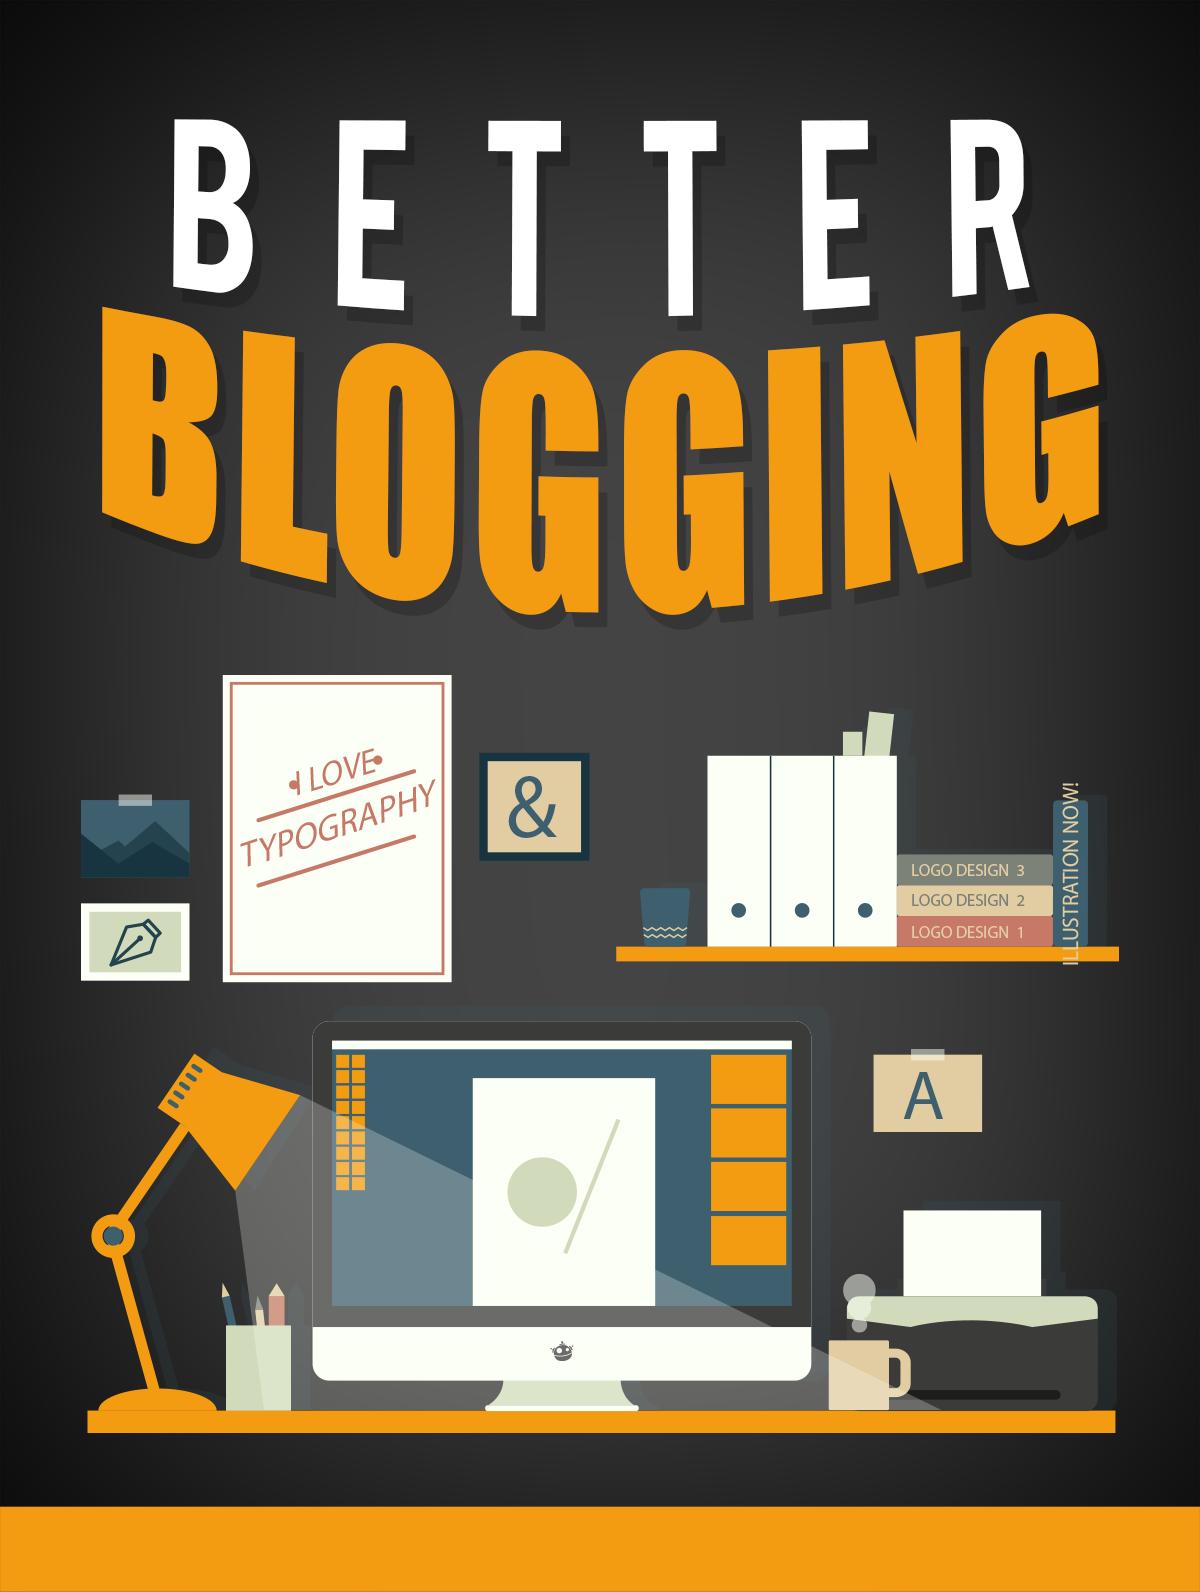 Better Blogging eBook